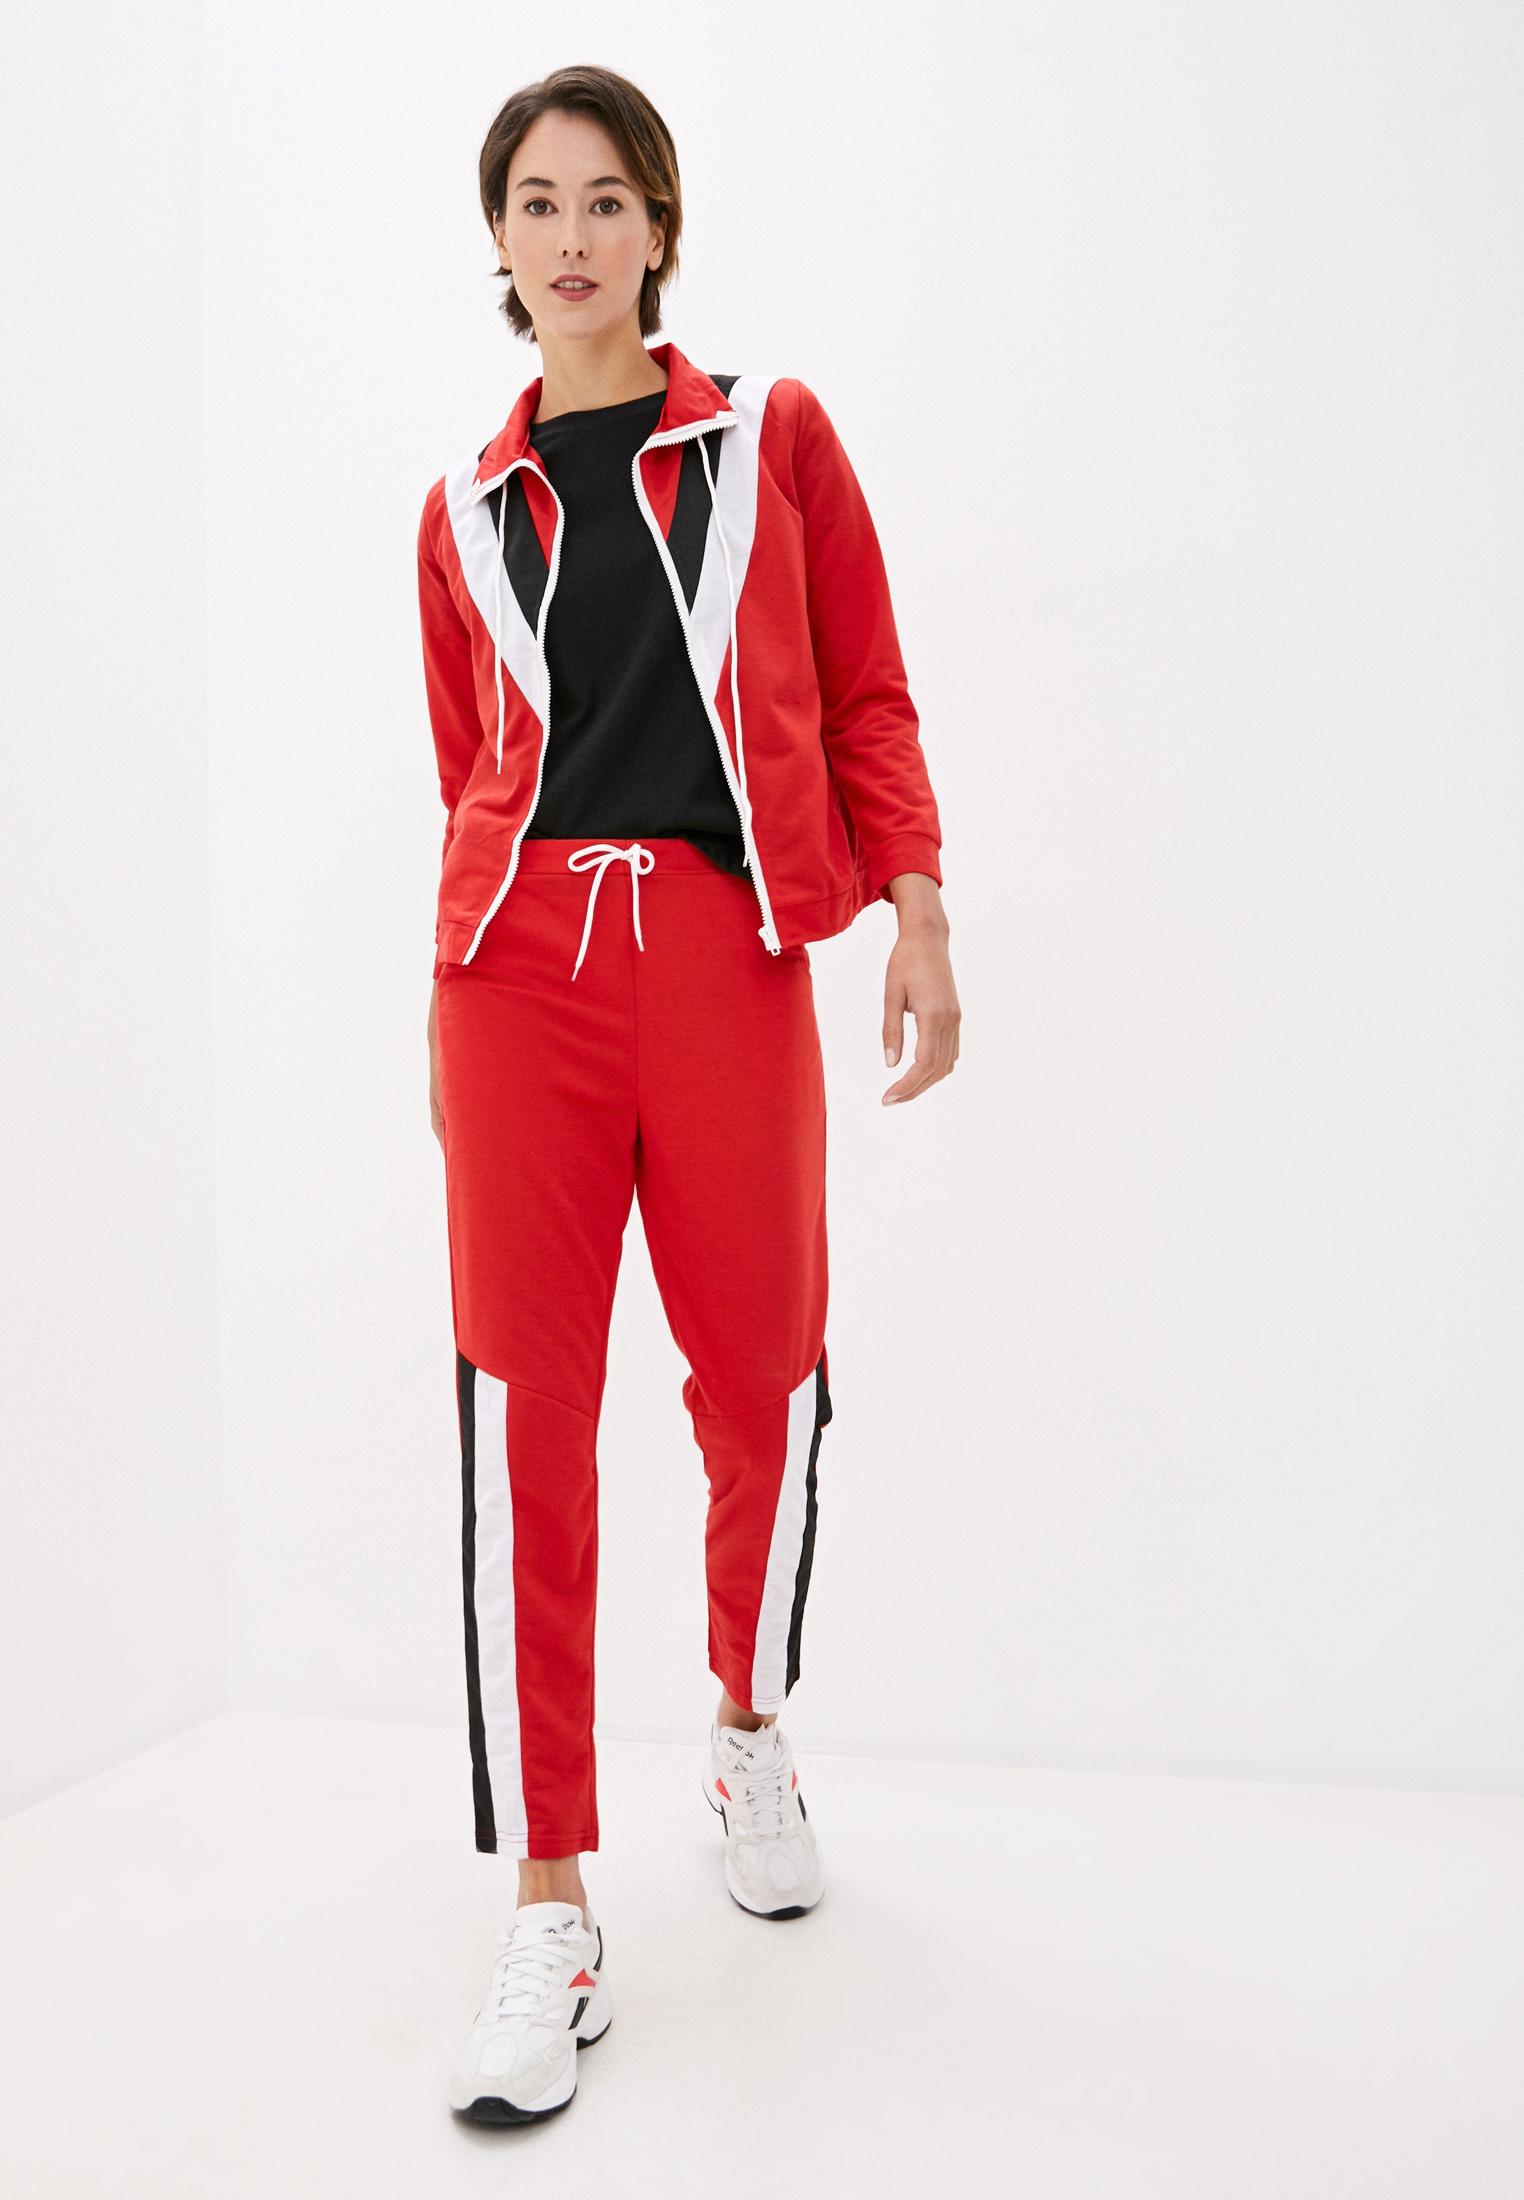 Спортивный костюм Modelle 1802